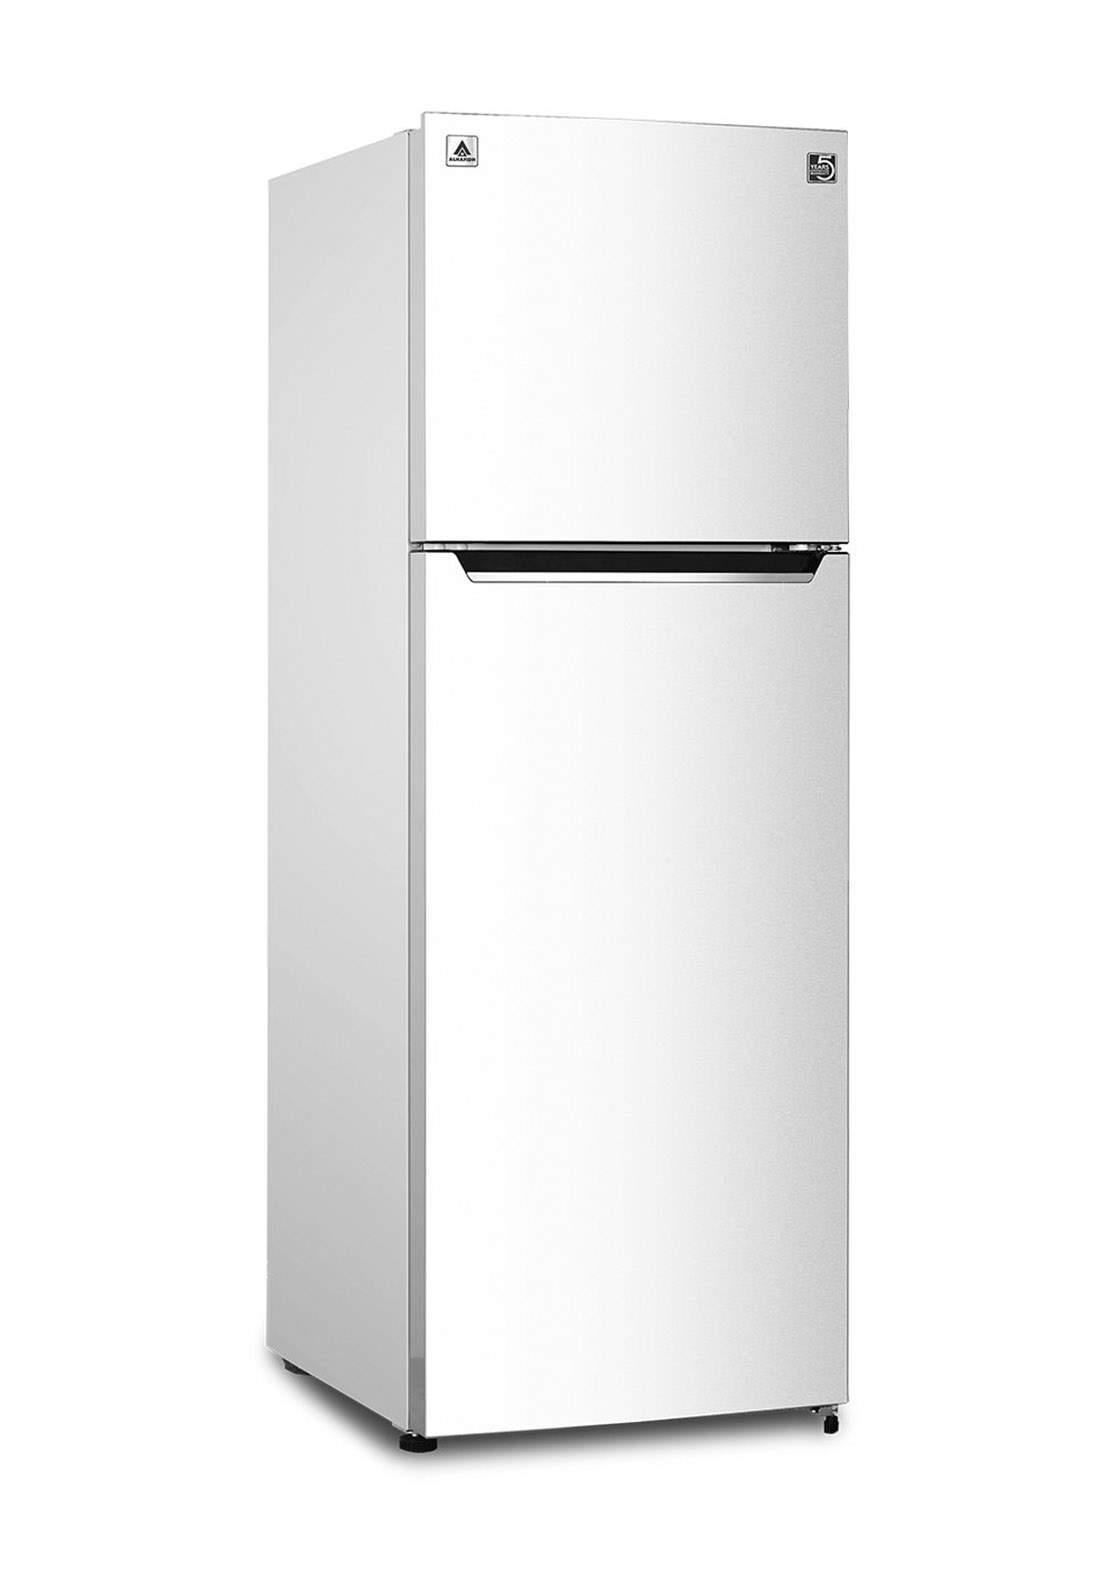 Alhafidh (RFHA-TM435NW1) 15cu.Ft. No Frost Top Mount Refrigerator ثلاجة بابين